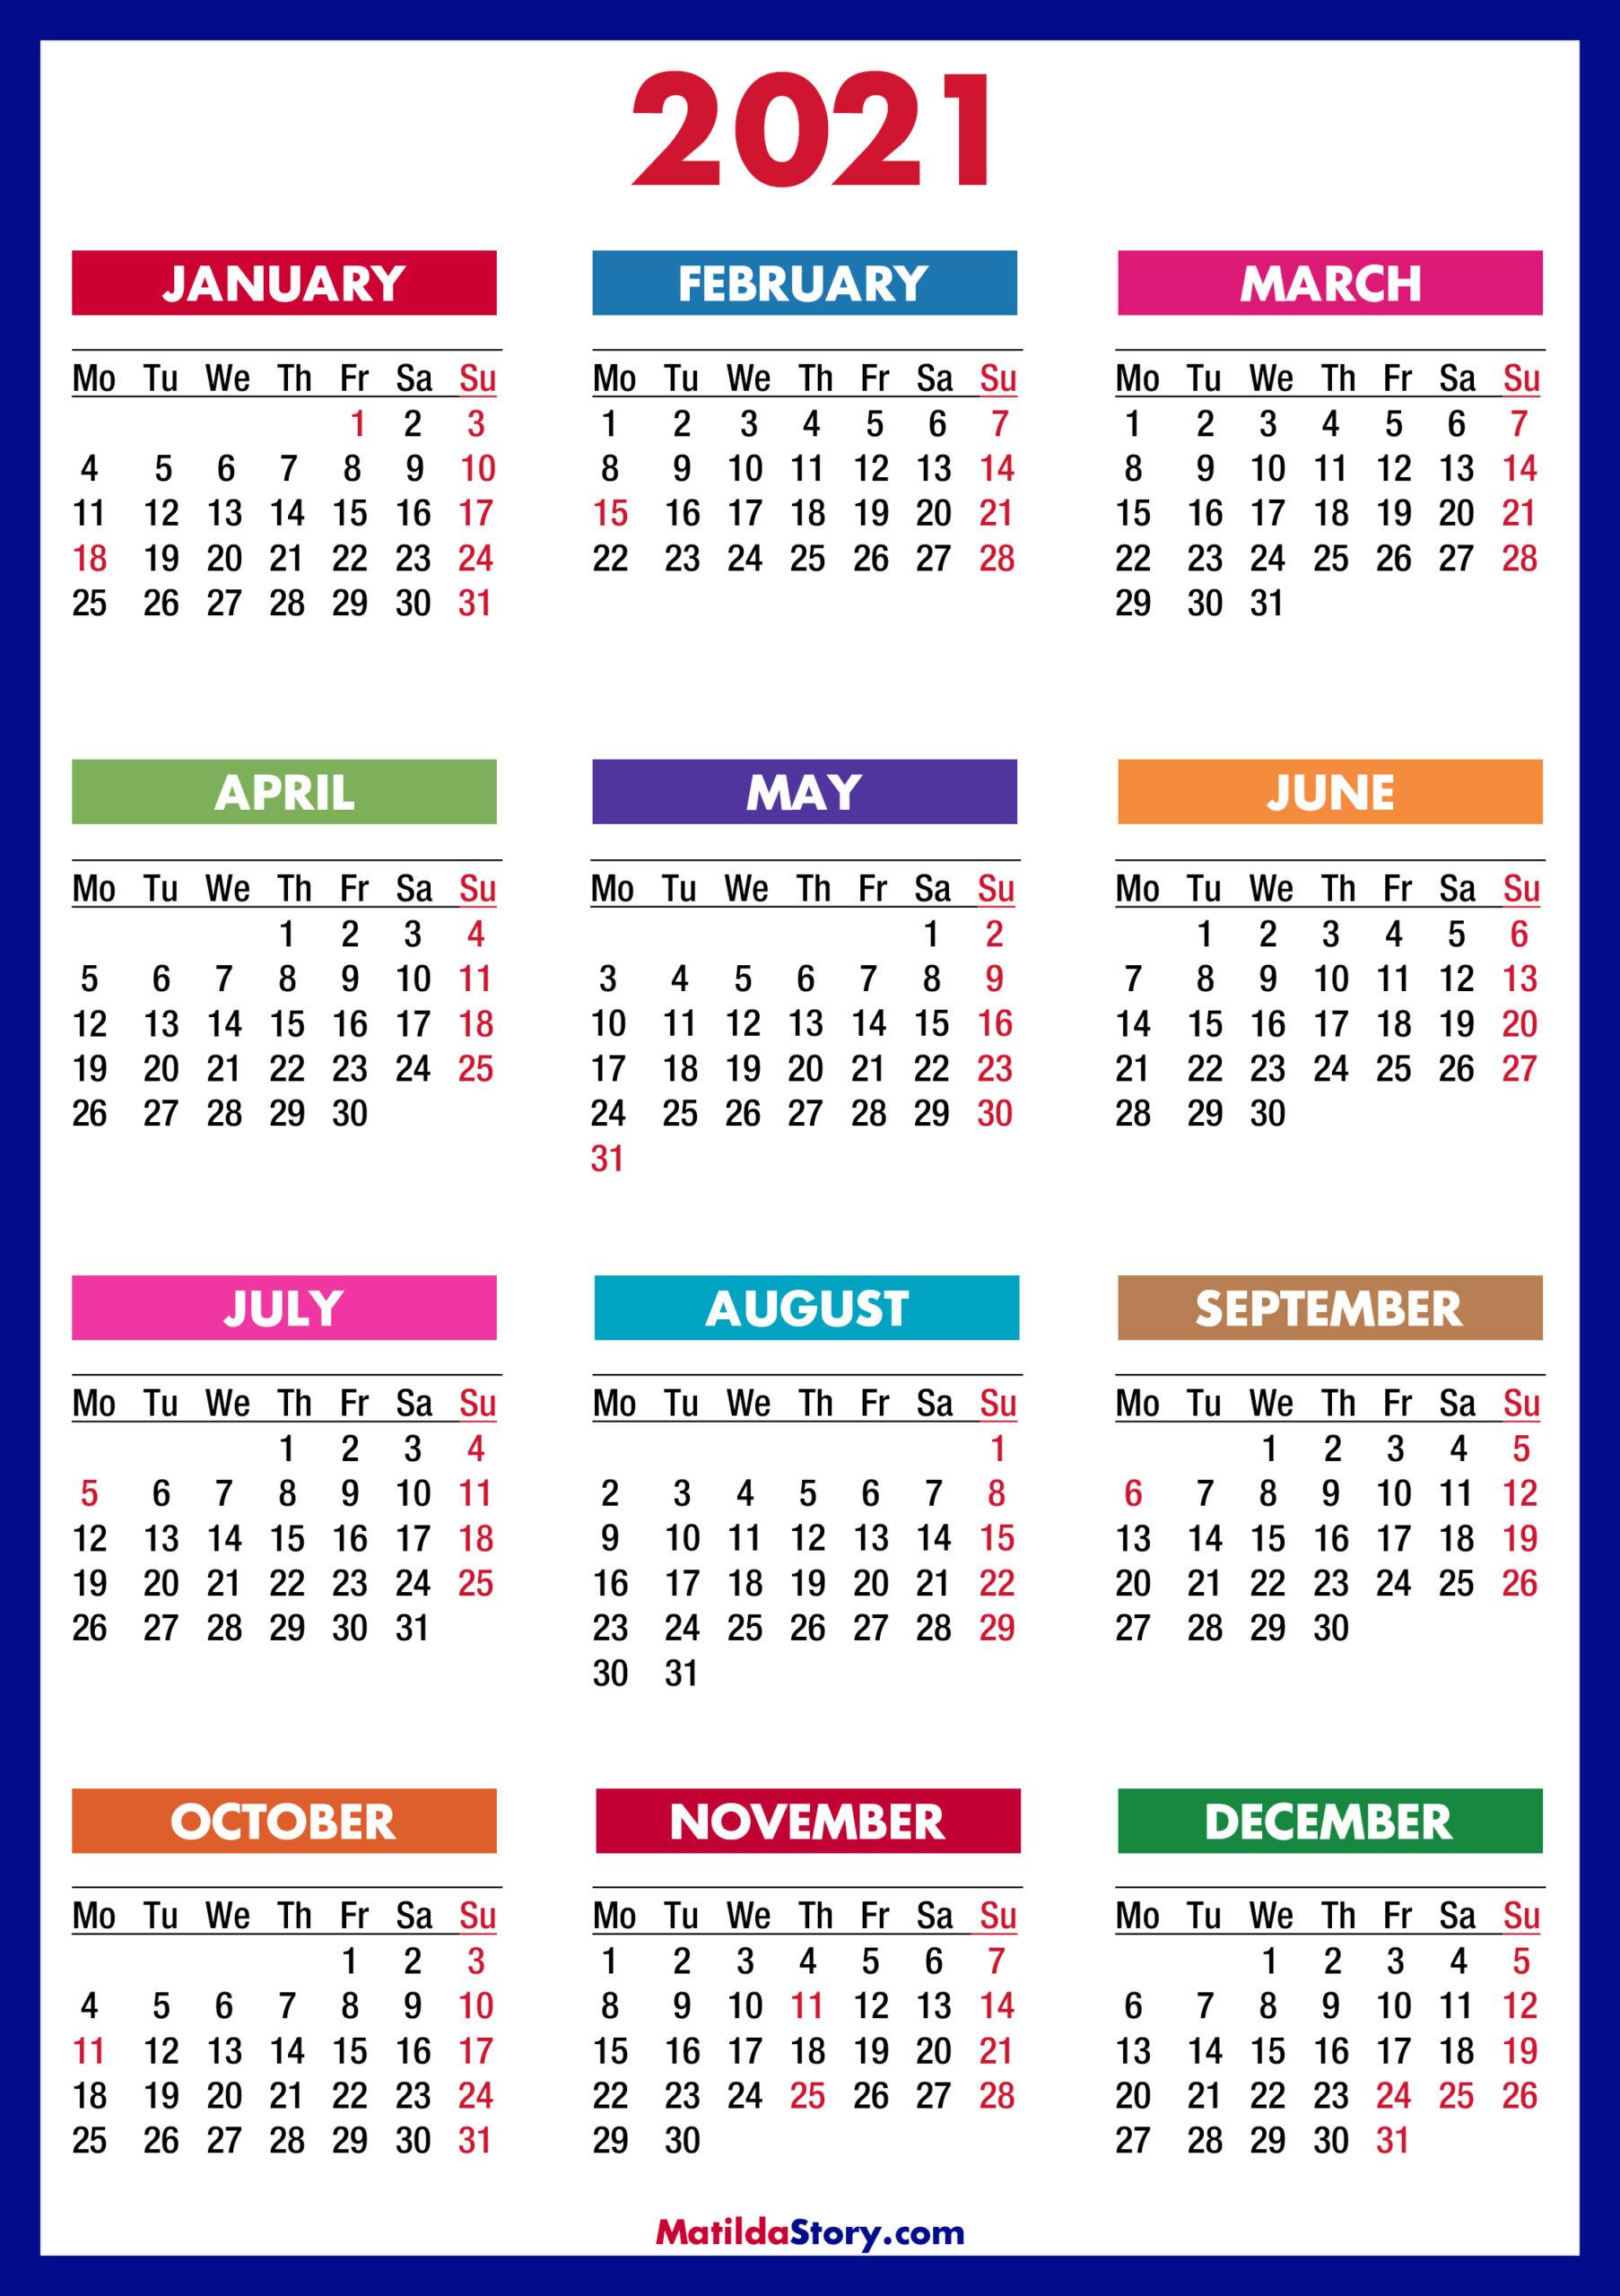 2021 Calendar With Holidays Usa | Printable Calendars 2021